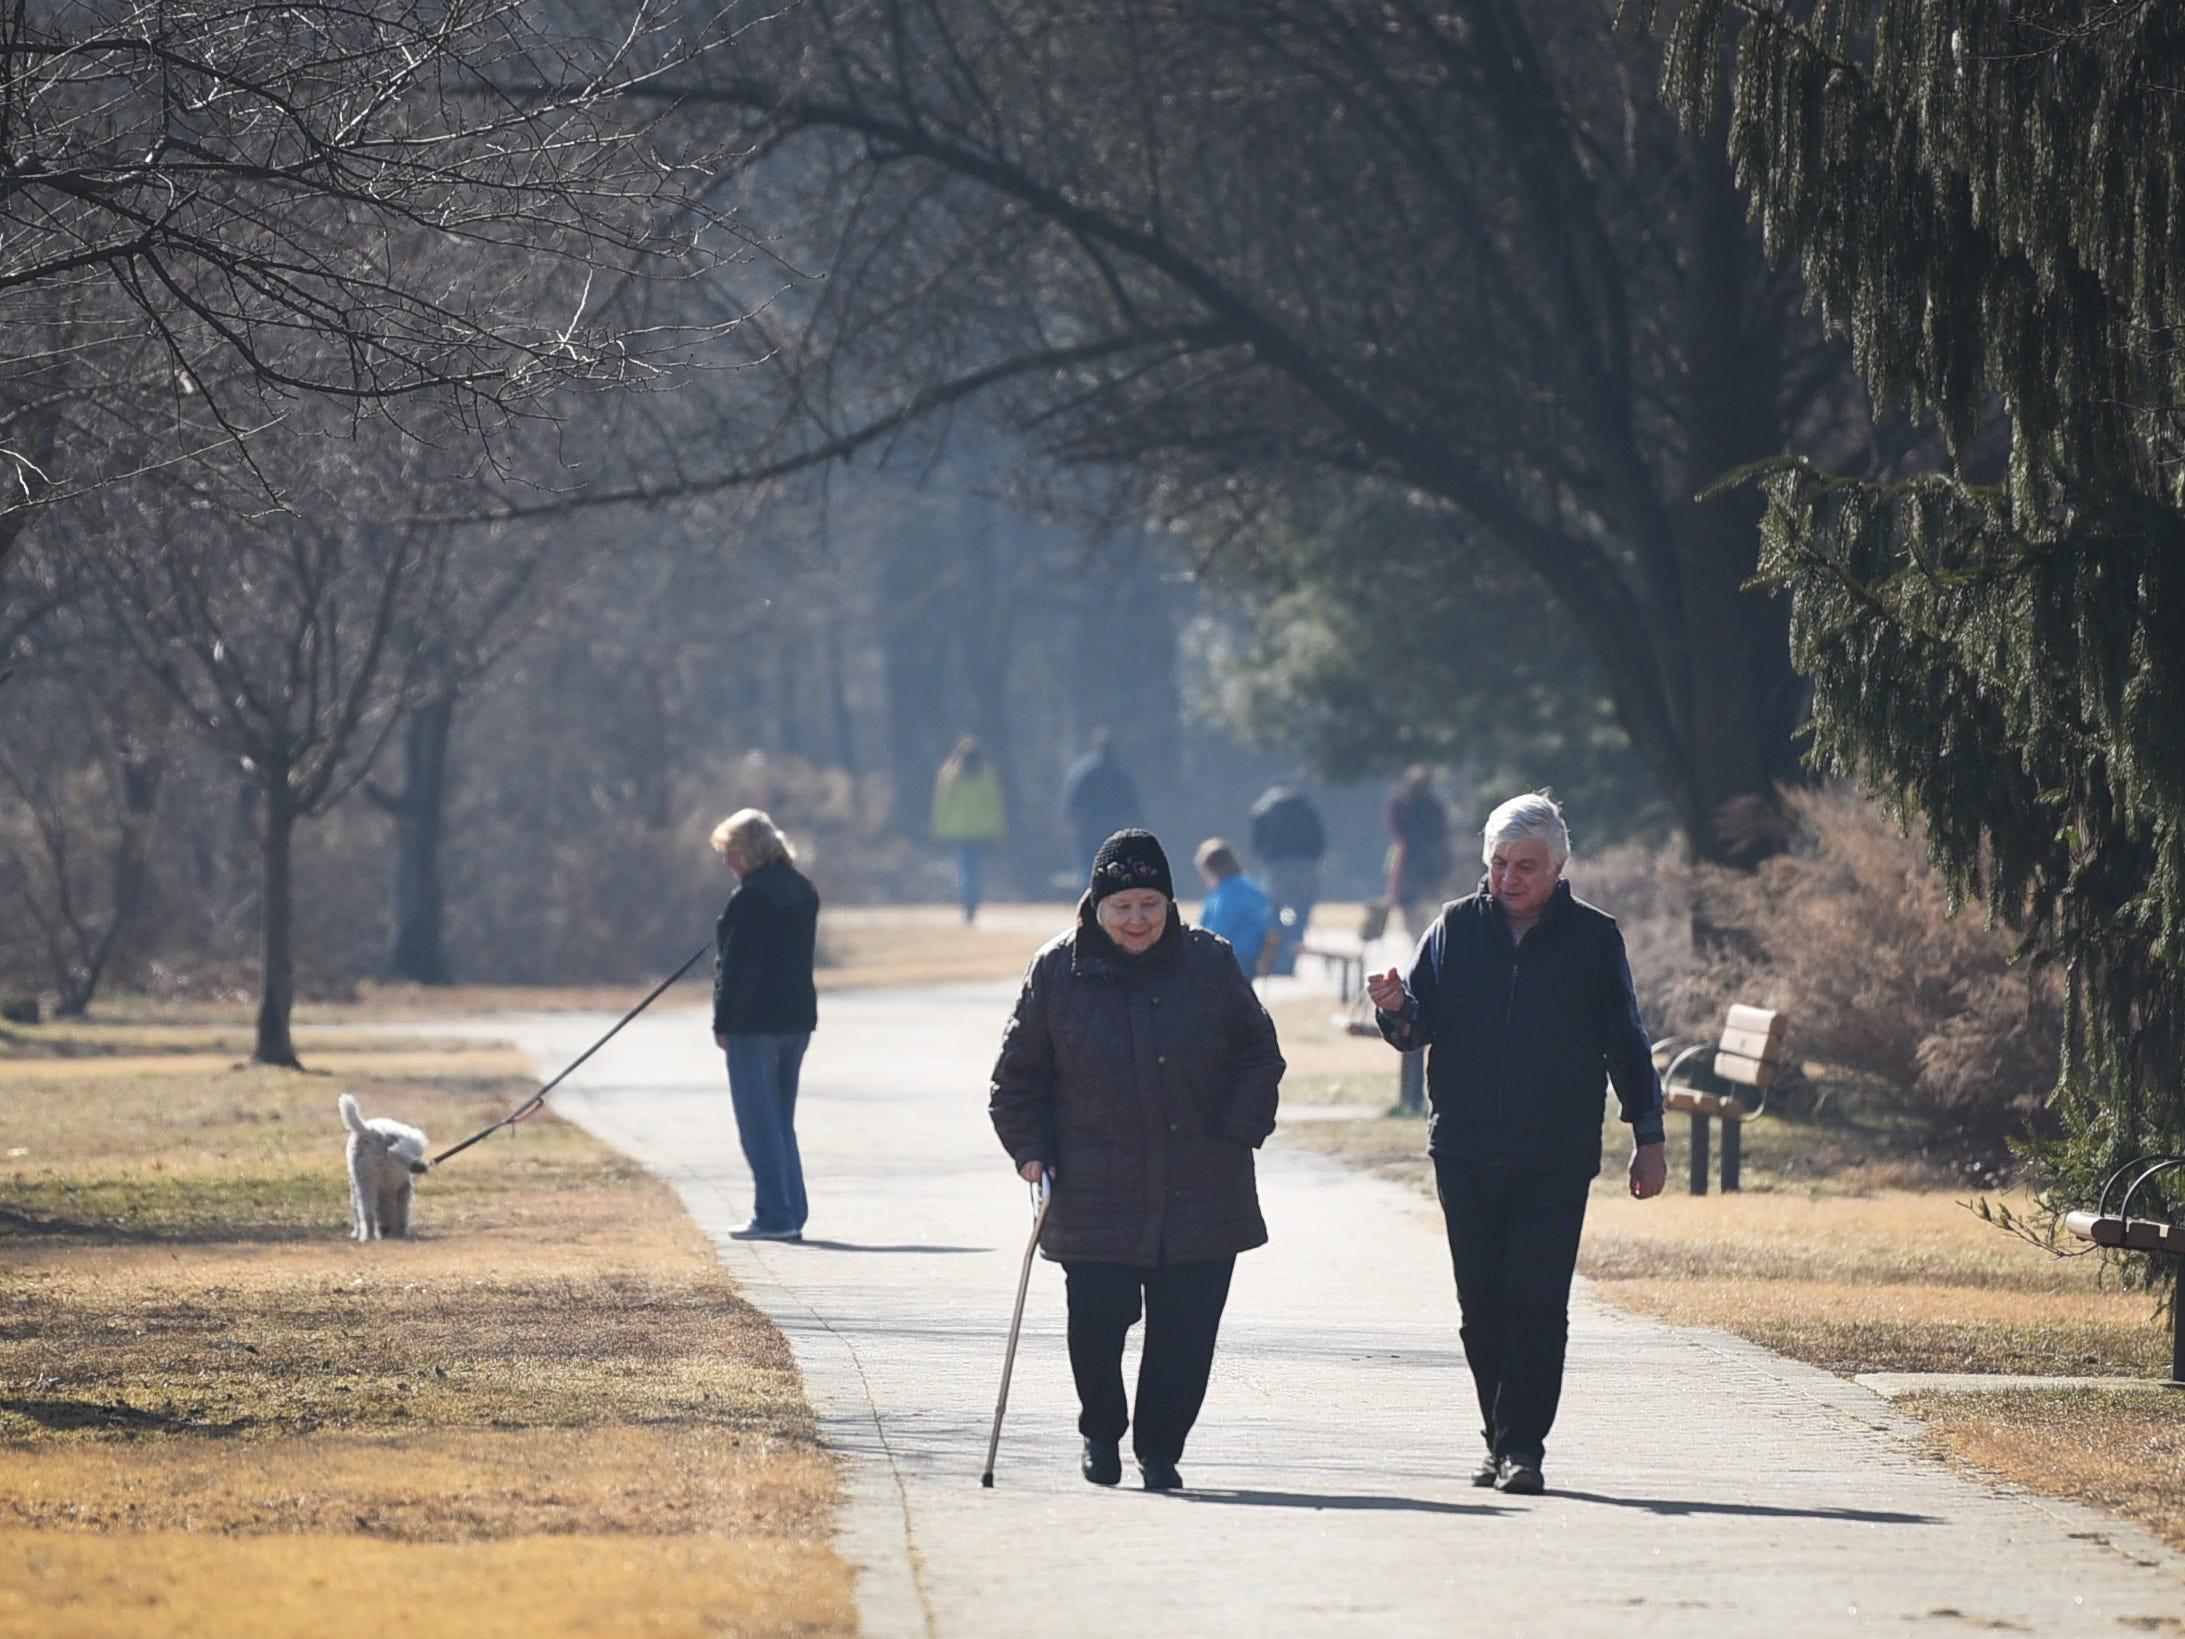 People enjoy the unseasonably warm weather at Van Saun County Park in Paramus on 02/05/19.